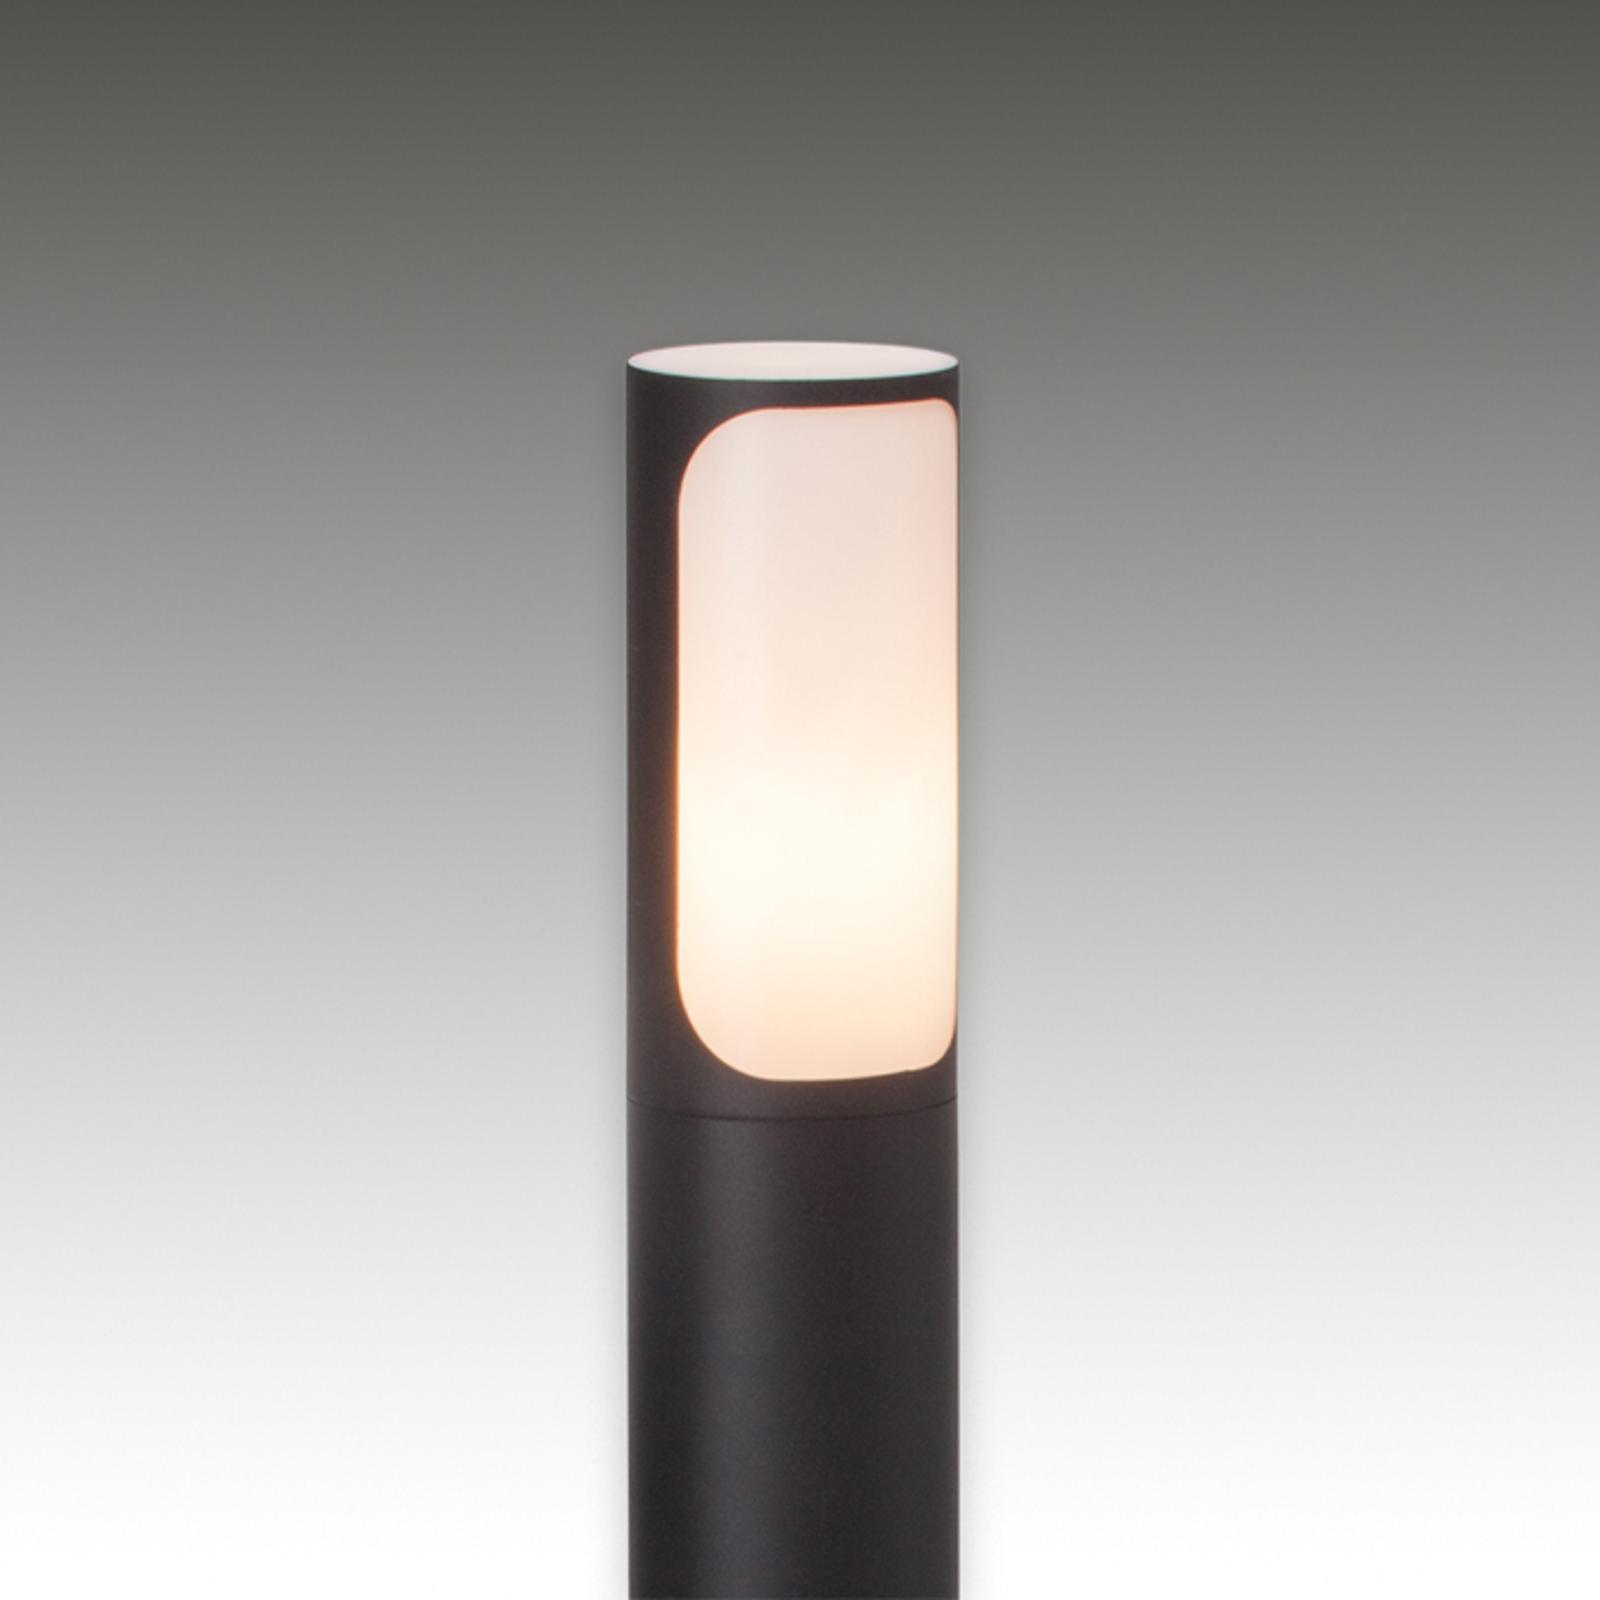 Tuinpadverlichting Gap voor spaarlamp